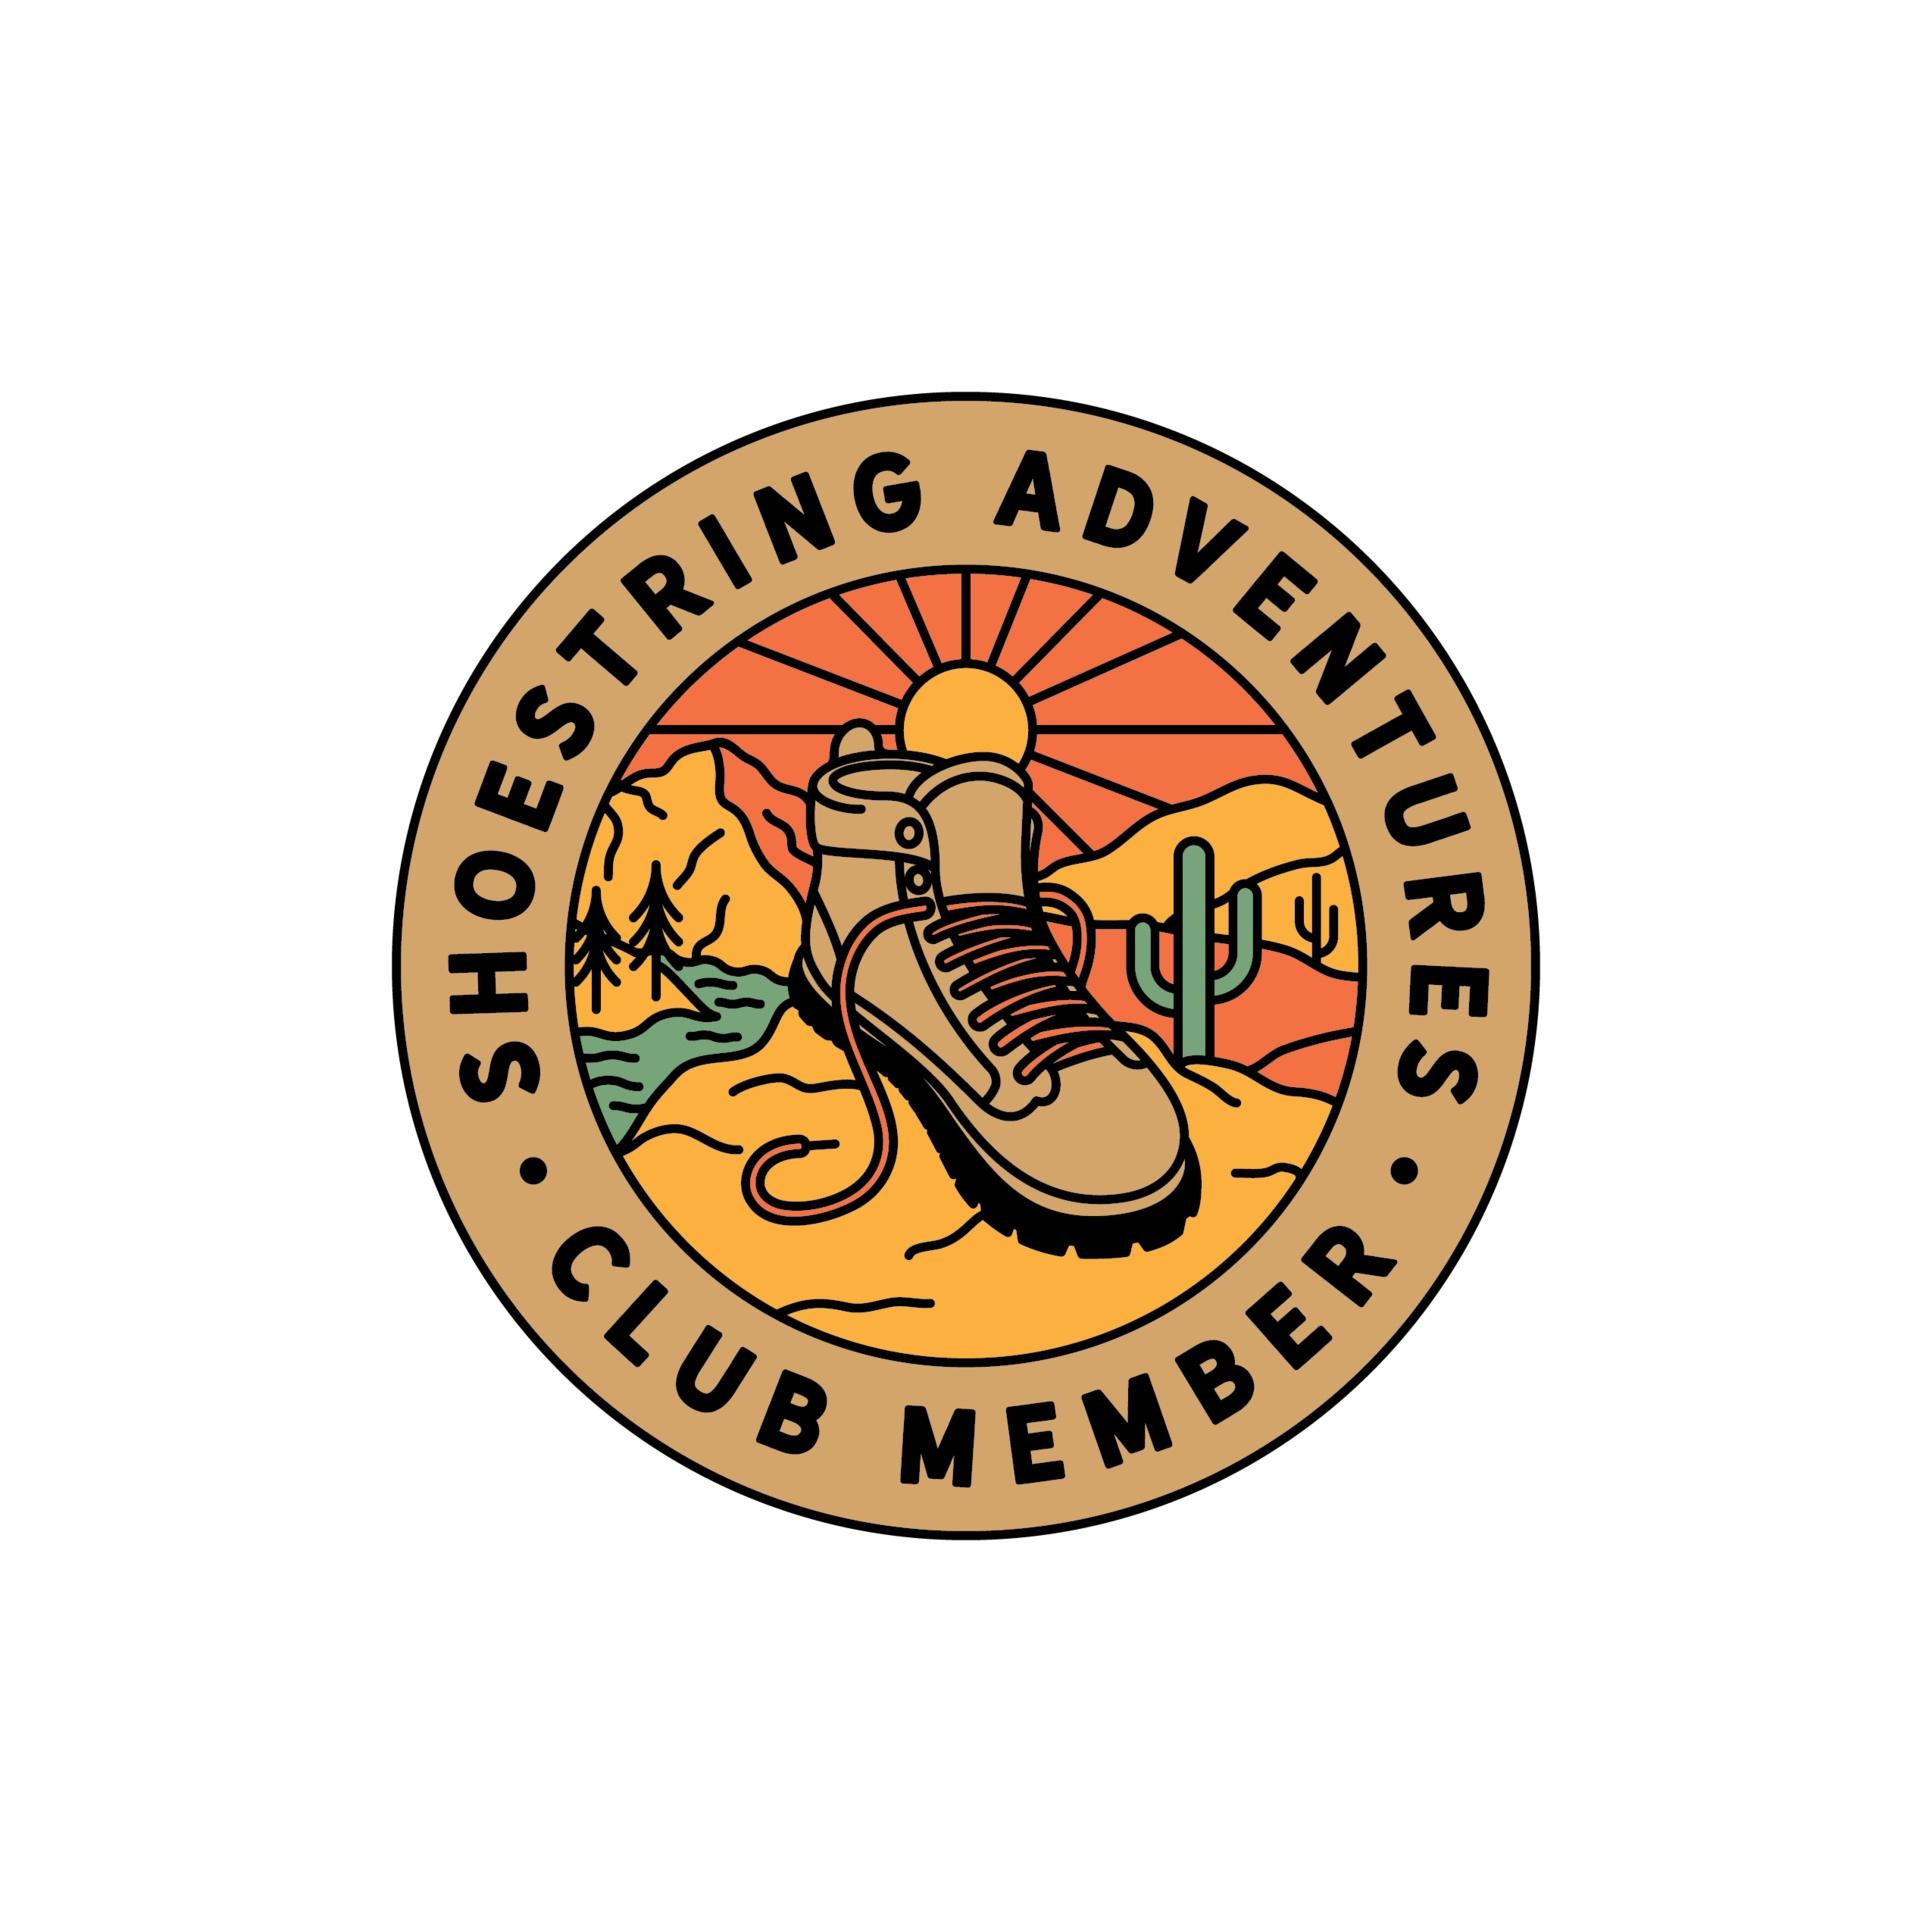 ShoestringAdventures-FinalClubMemberPatch-05048-01.jpg